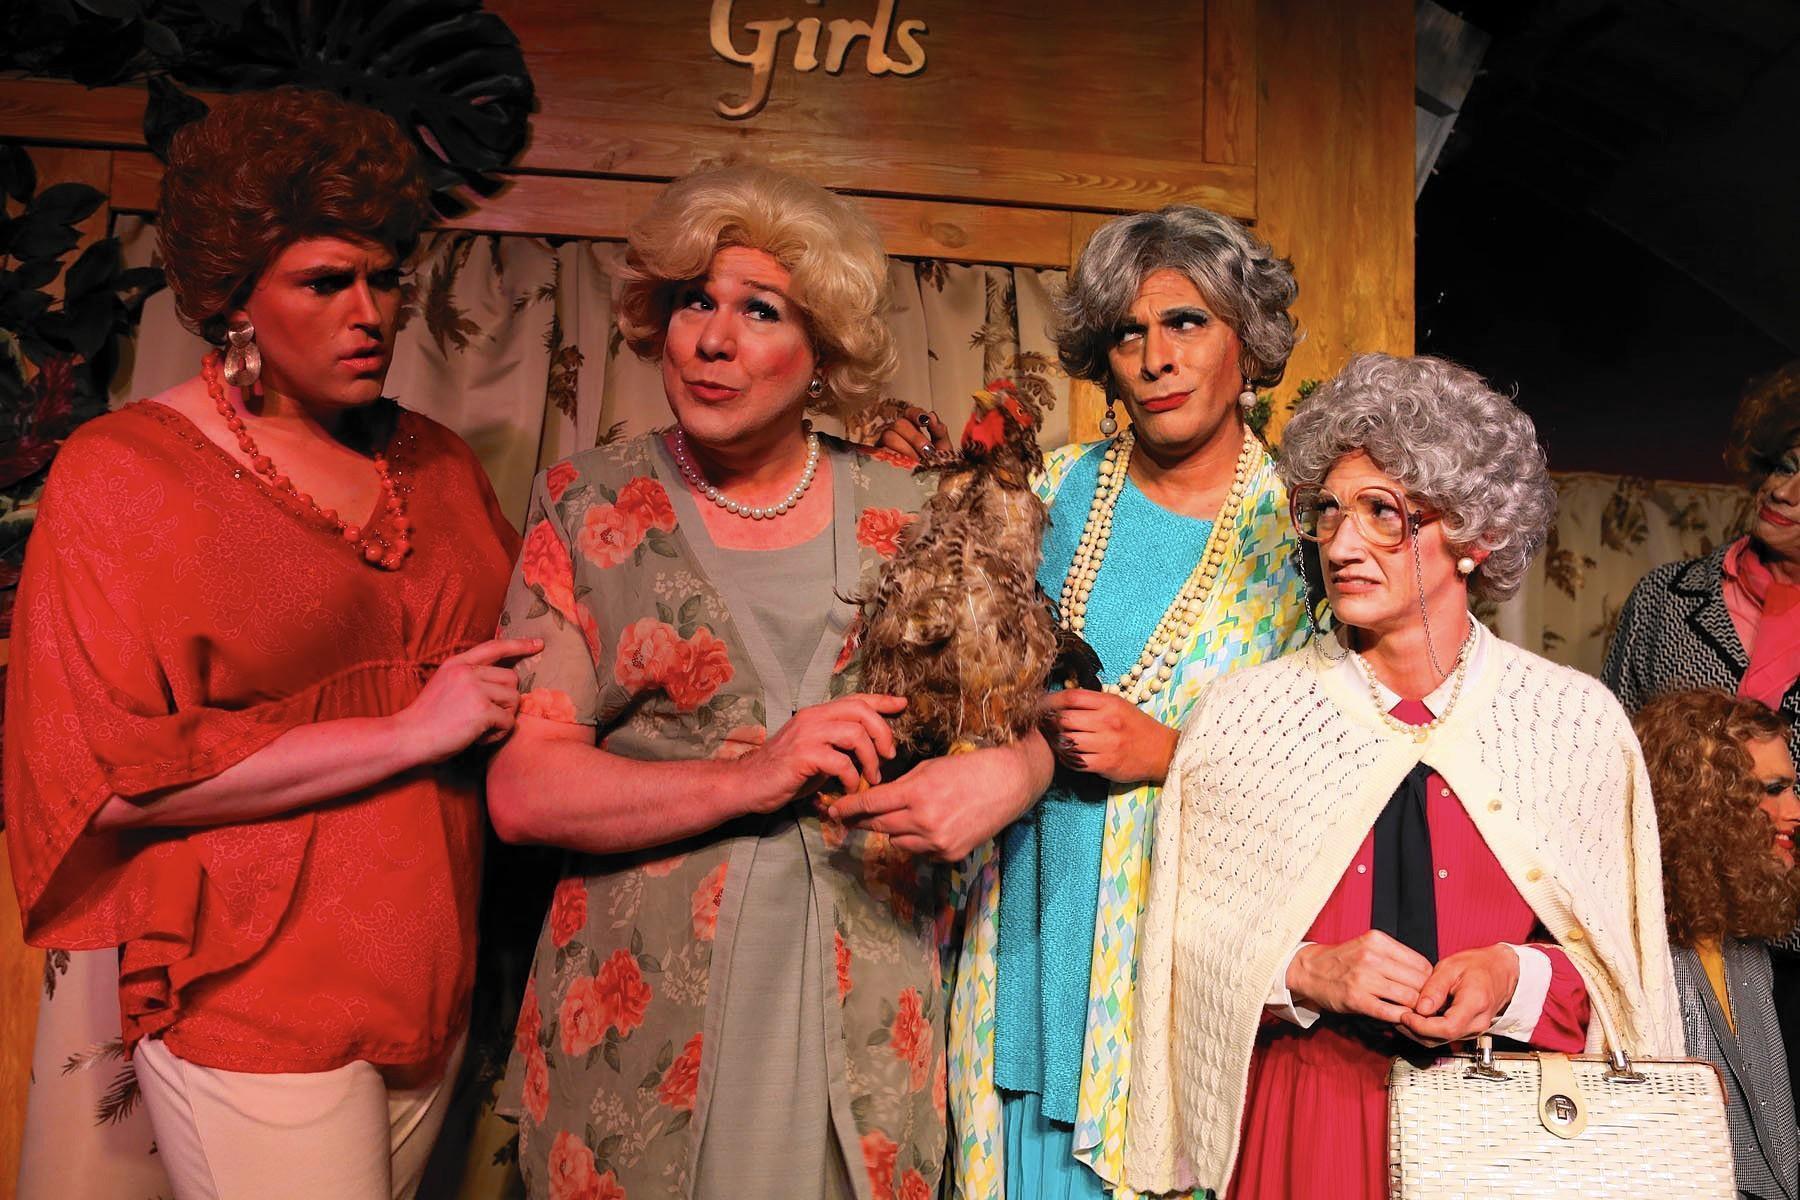 Campy Golden Girls Spoof Misses The Mark Chicago Tribune